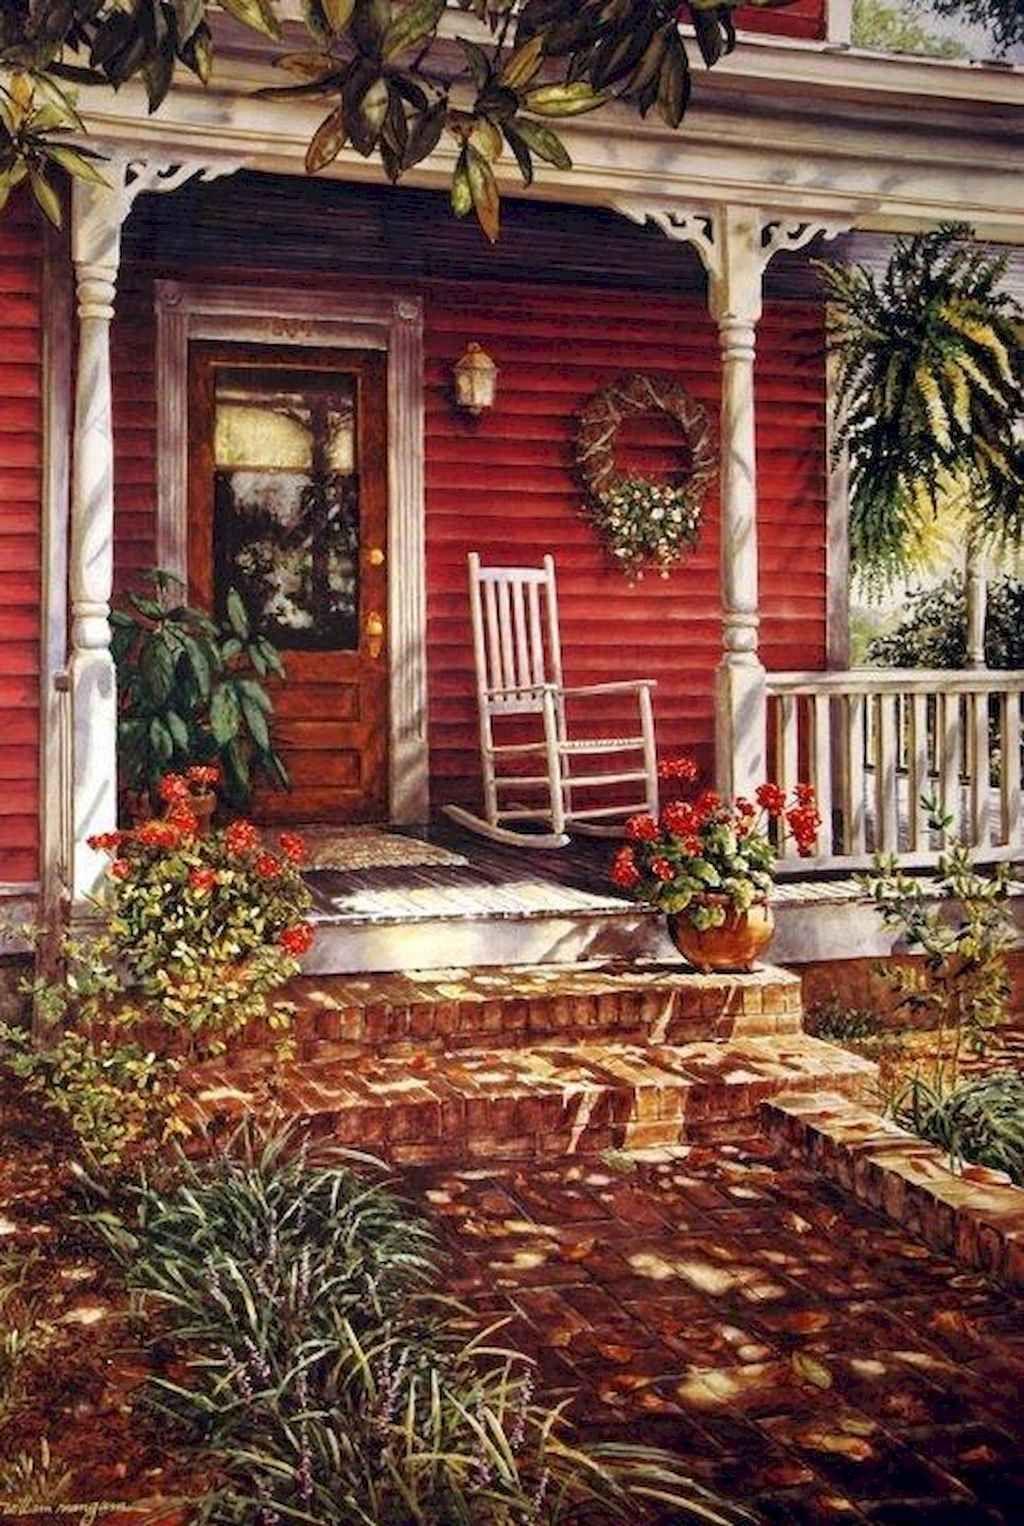 85 Farmhouse Front Porch Makeover Design Ideas In 2020 Hazak Terasz Videk